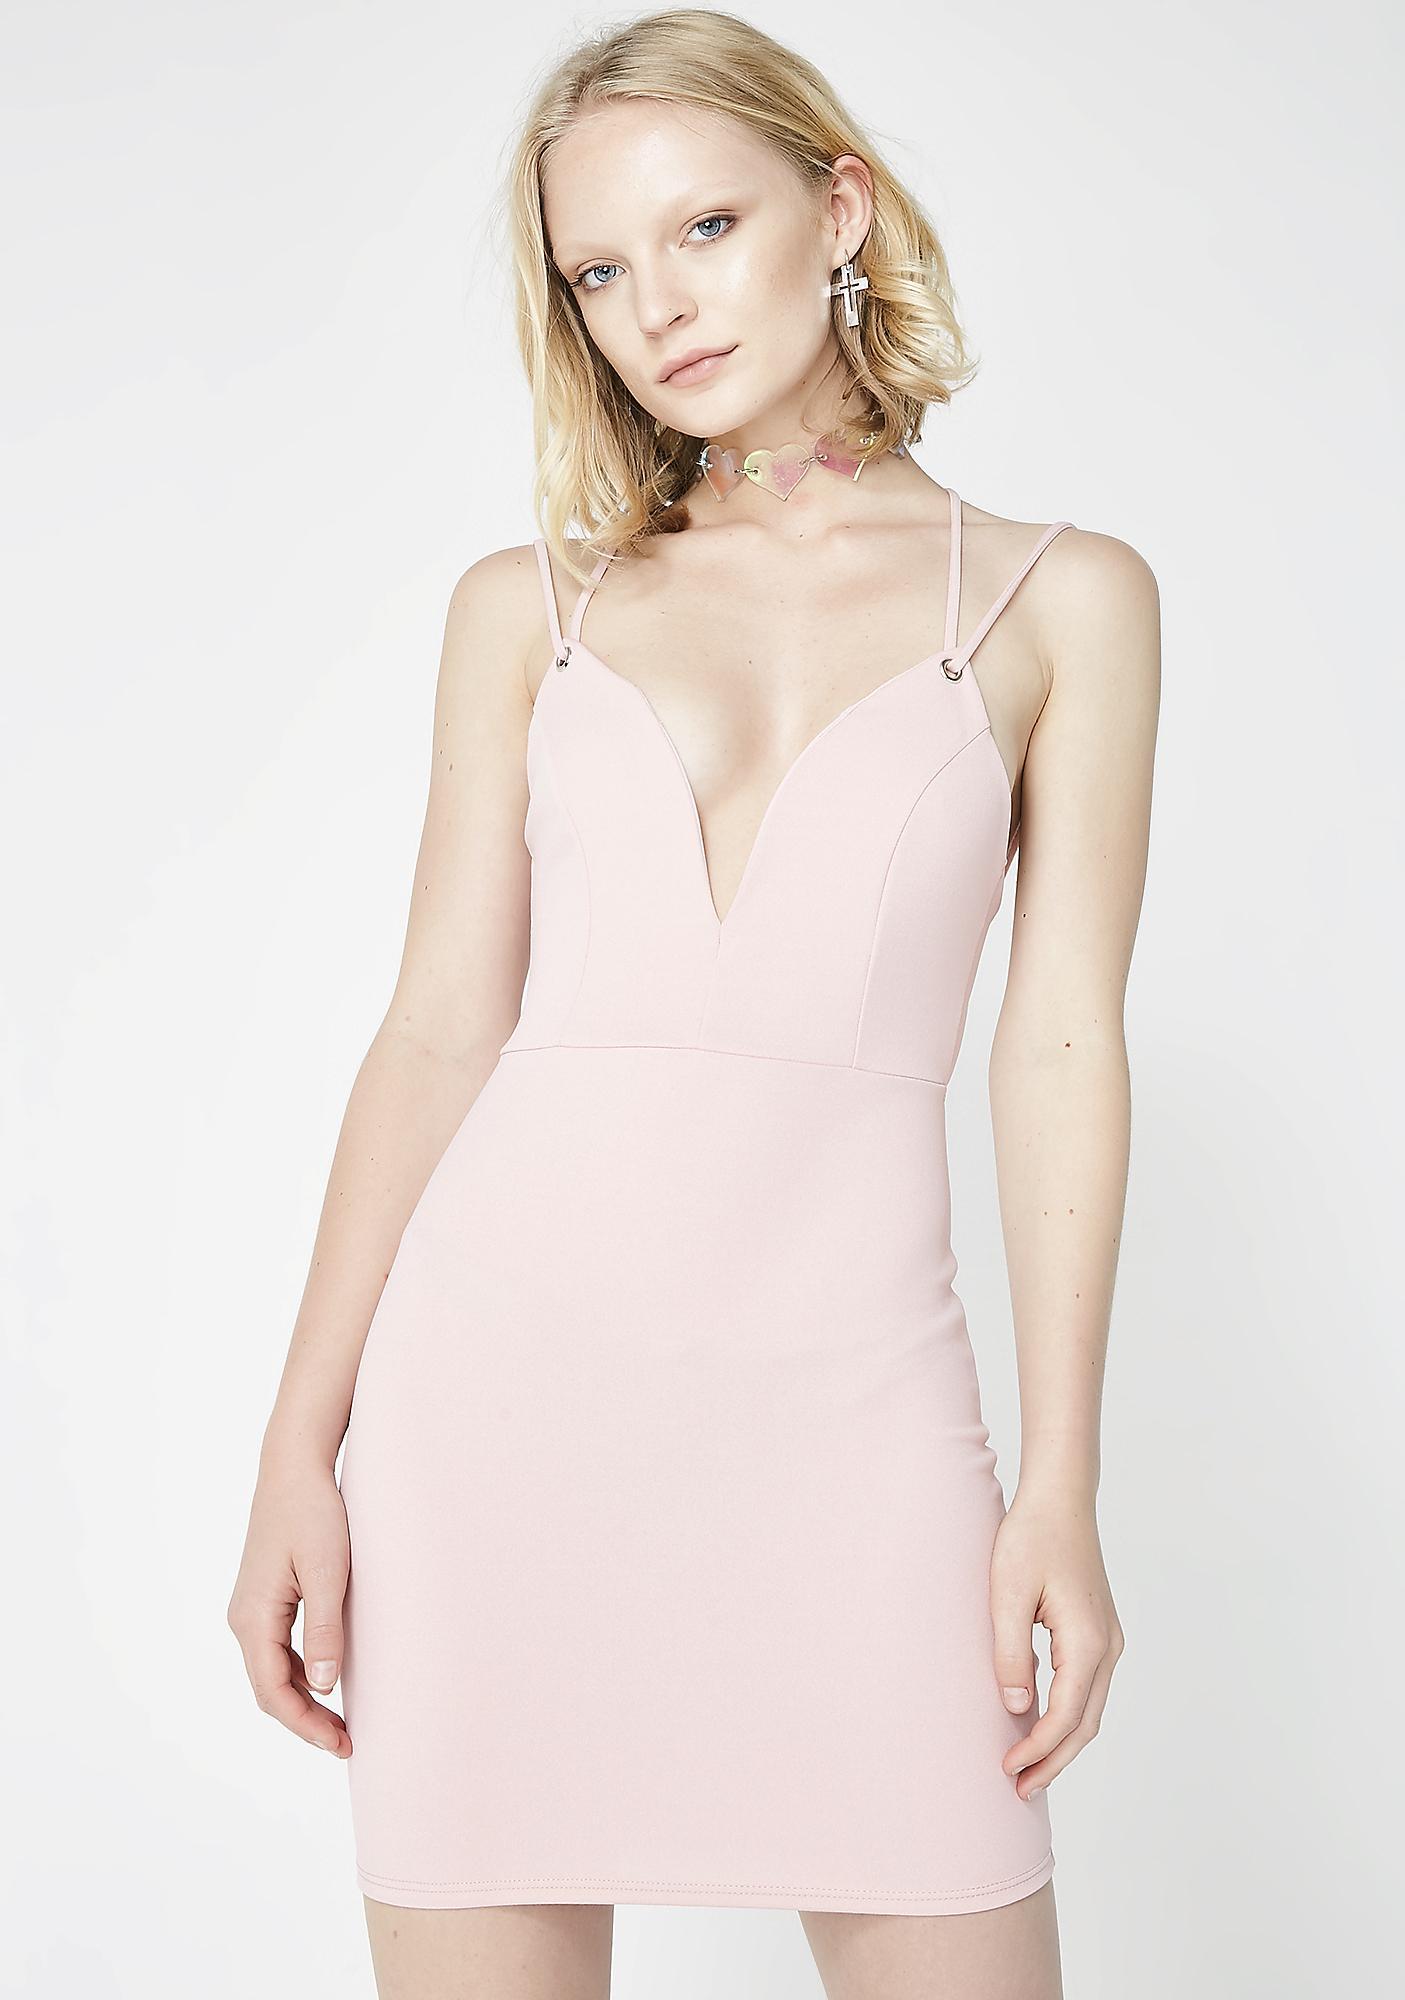 Candy Craving Mini Dress